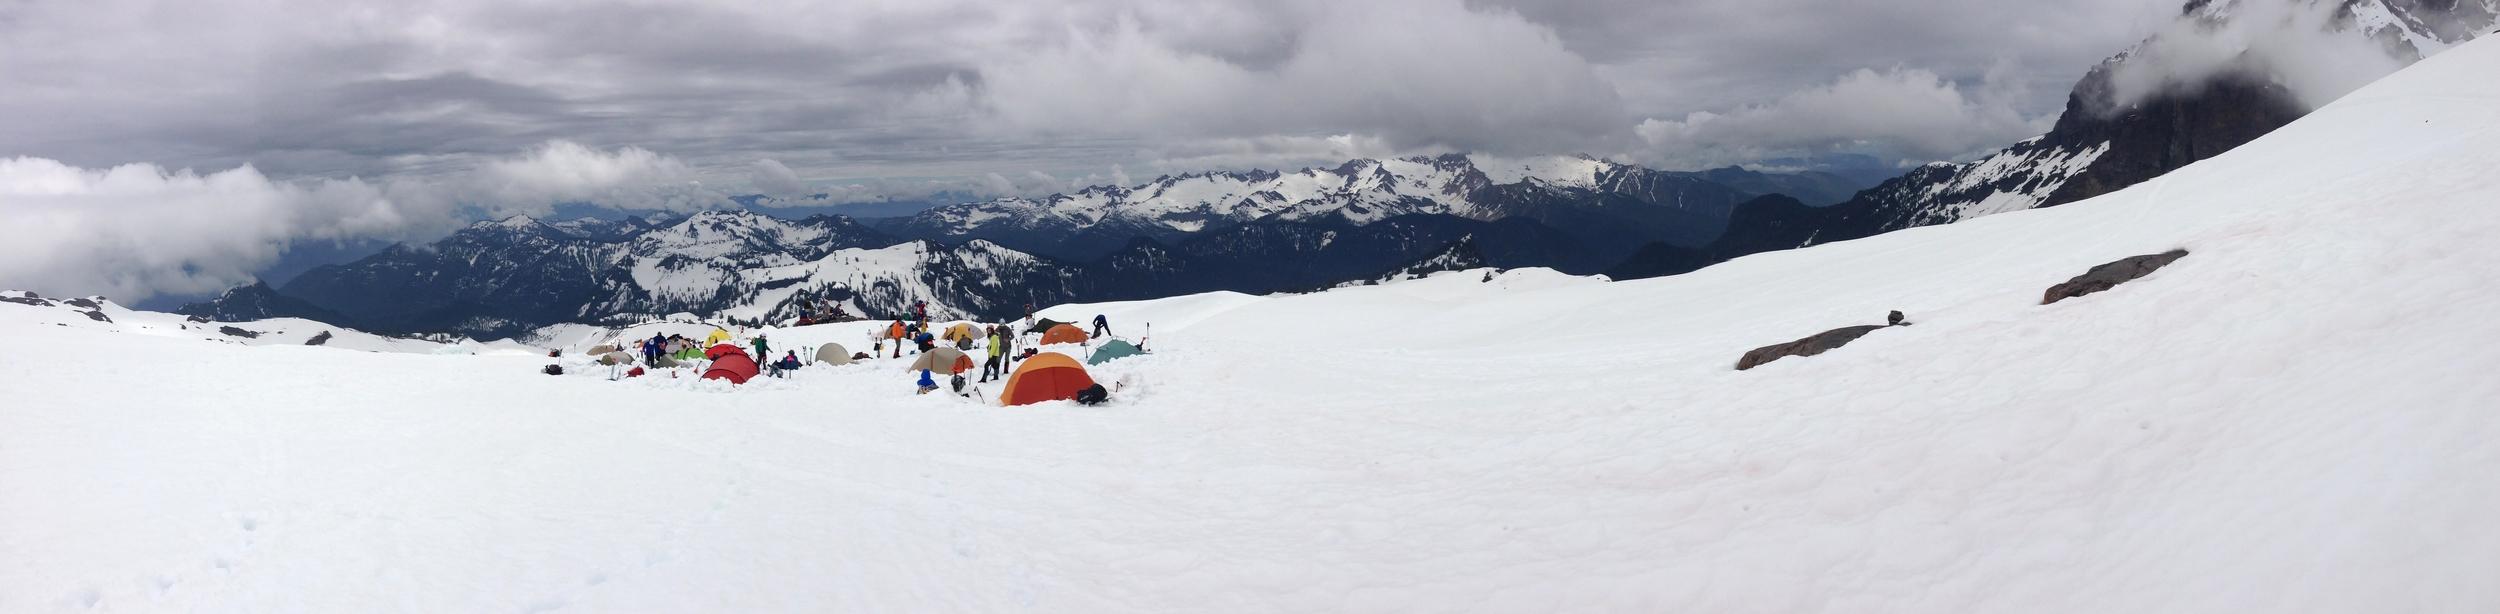 Camp near the Easton Glacier. Washington Alpine Club.